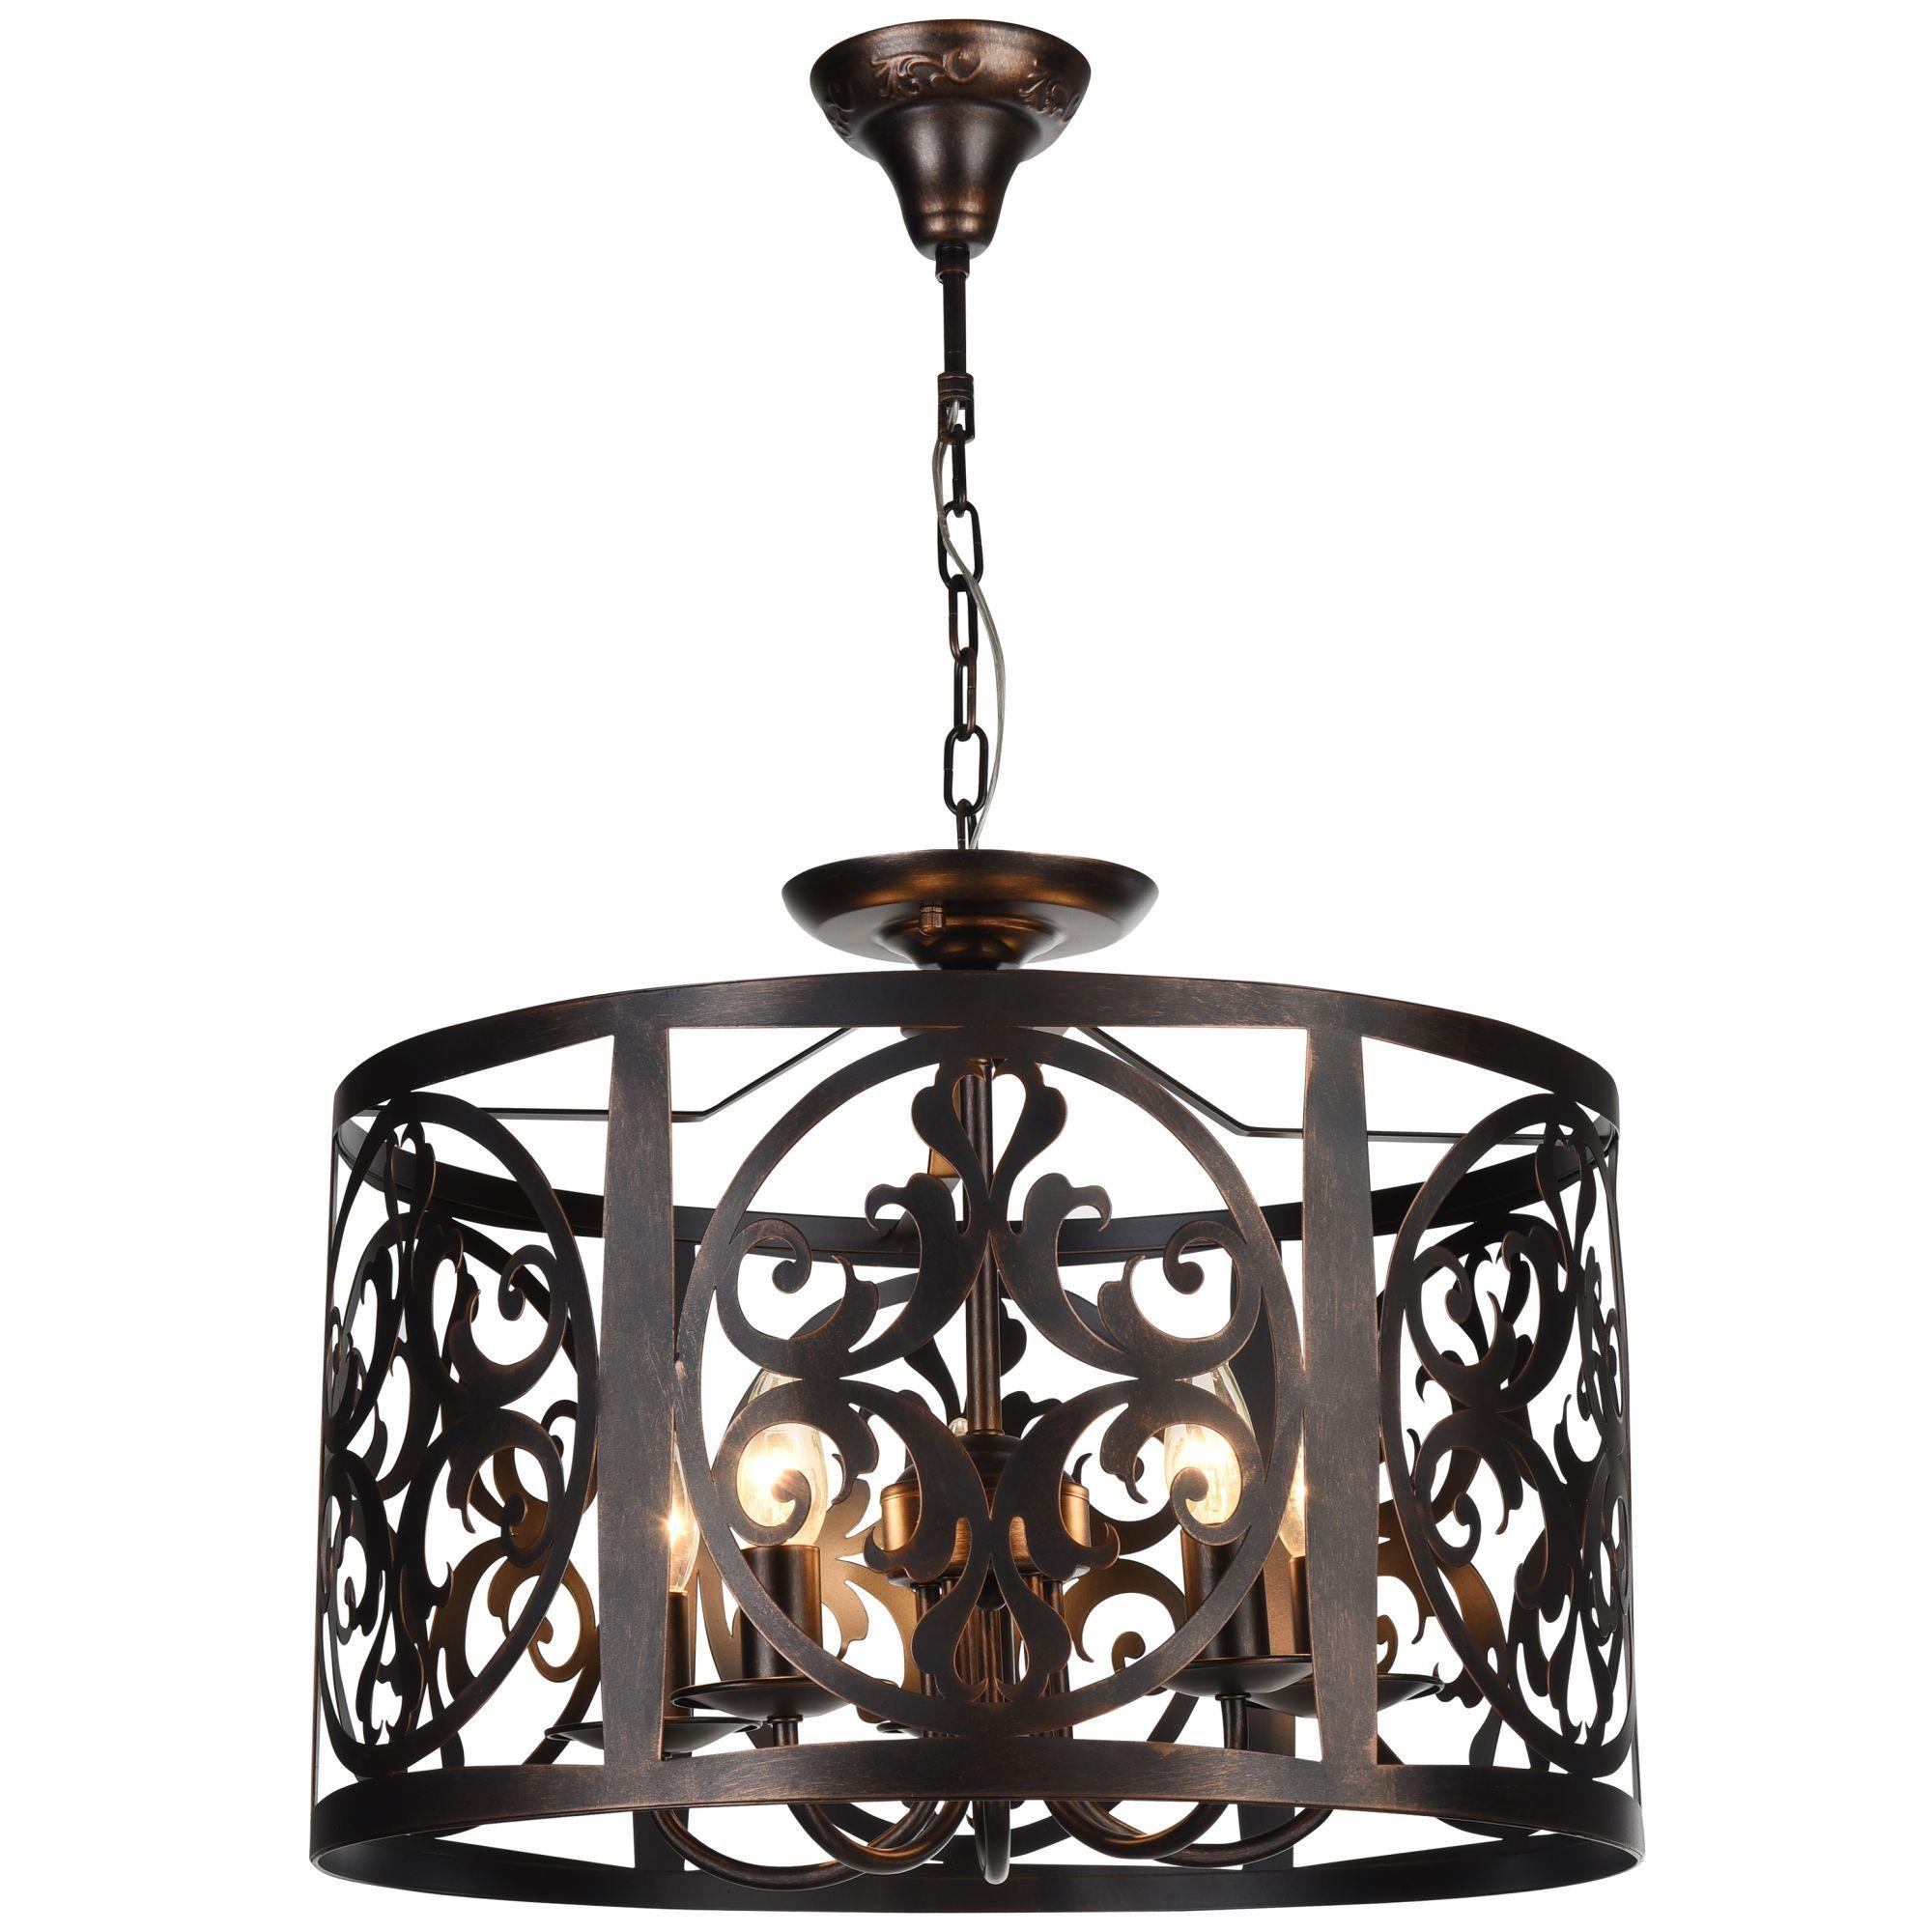 Подвесная люстра Maytoni Rustika H899-05-R, 5xE14x60W, коричневый, металл, ковка - фото 2